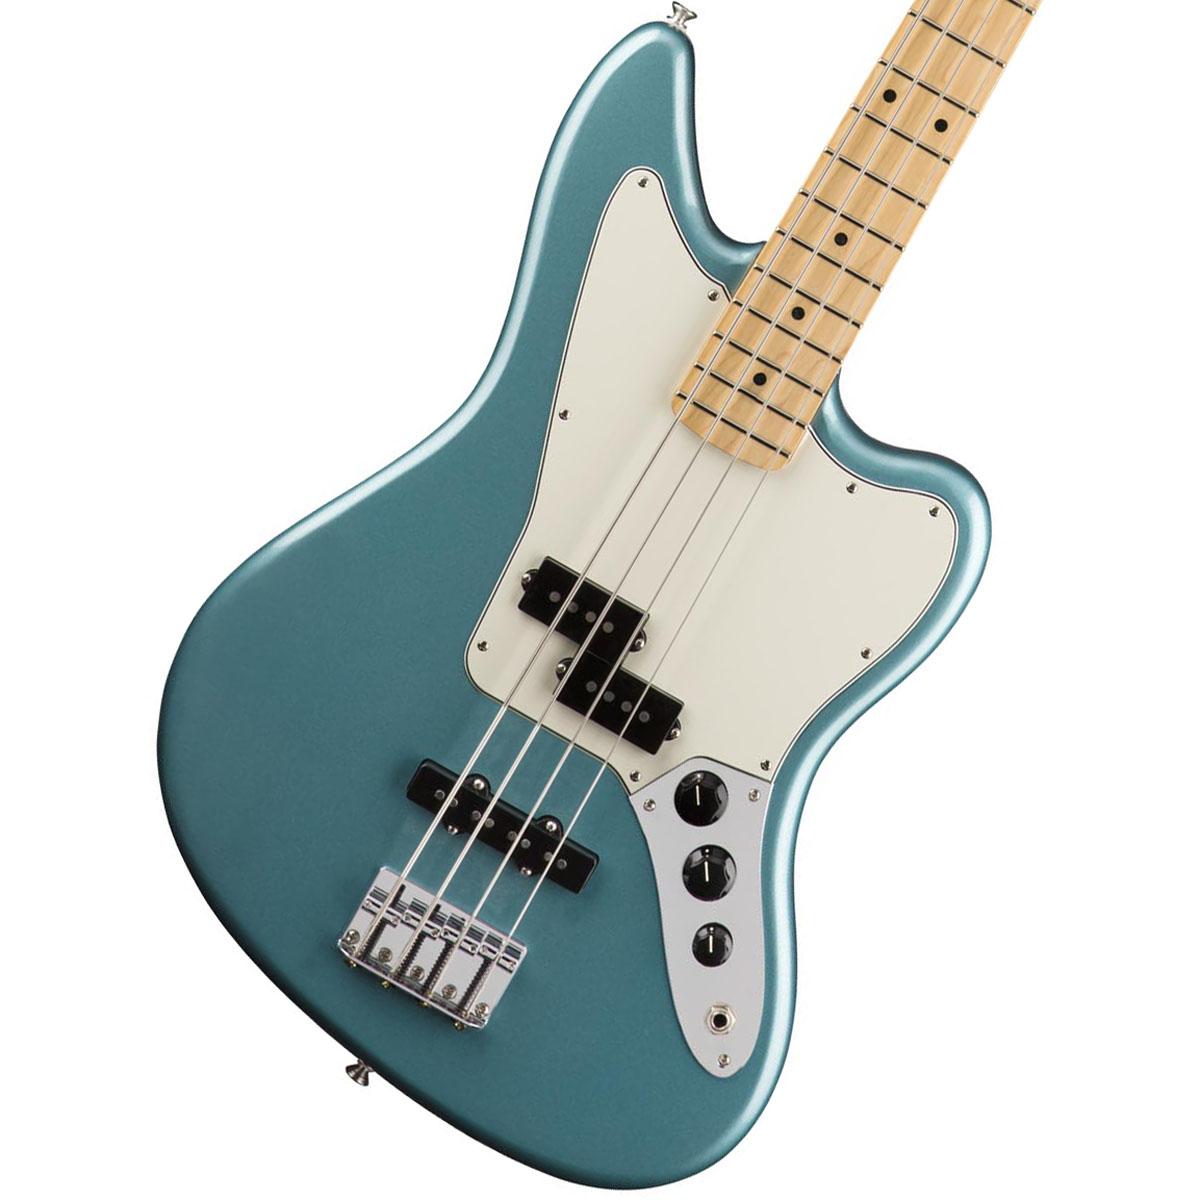 Fender / Player Series Jaguar Bass Tidepool Maple 【YRK】【新品特価】